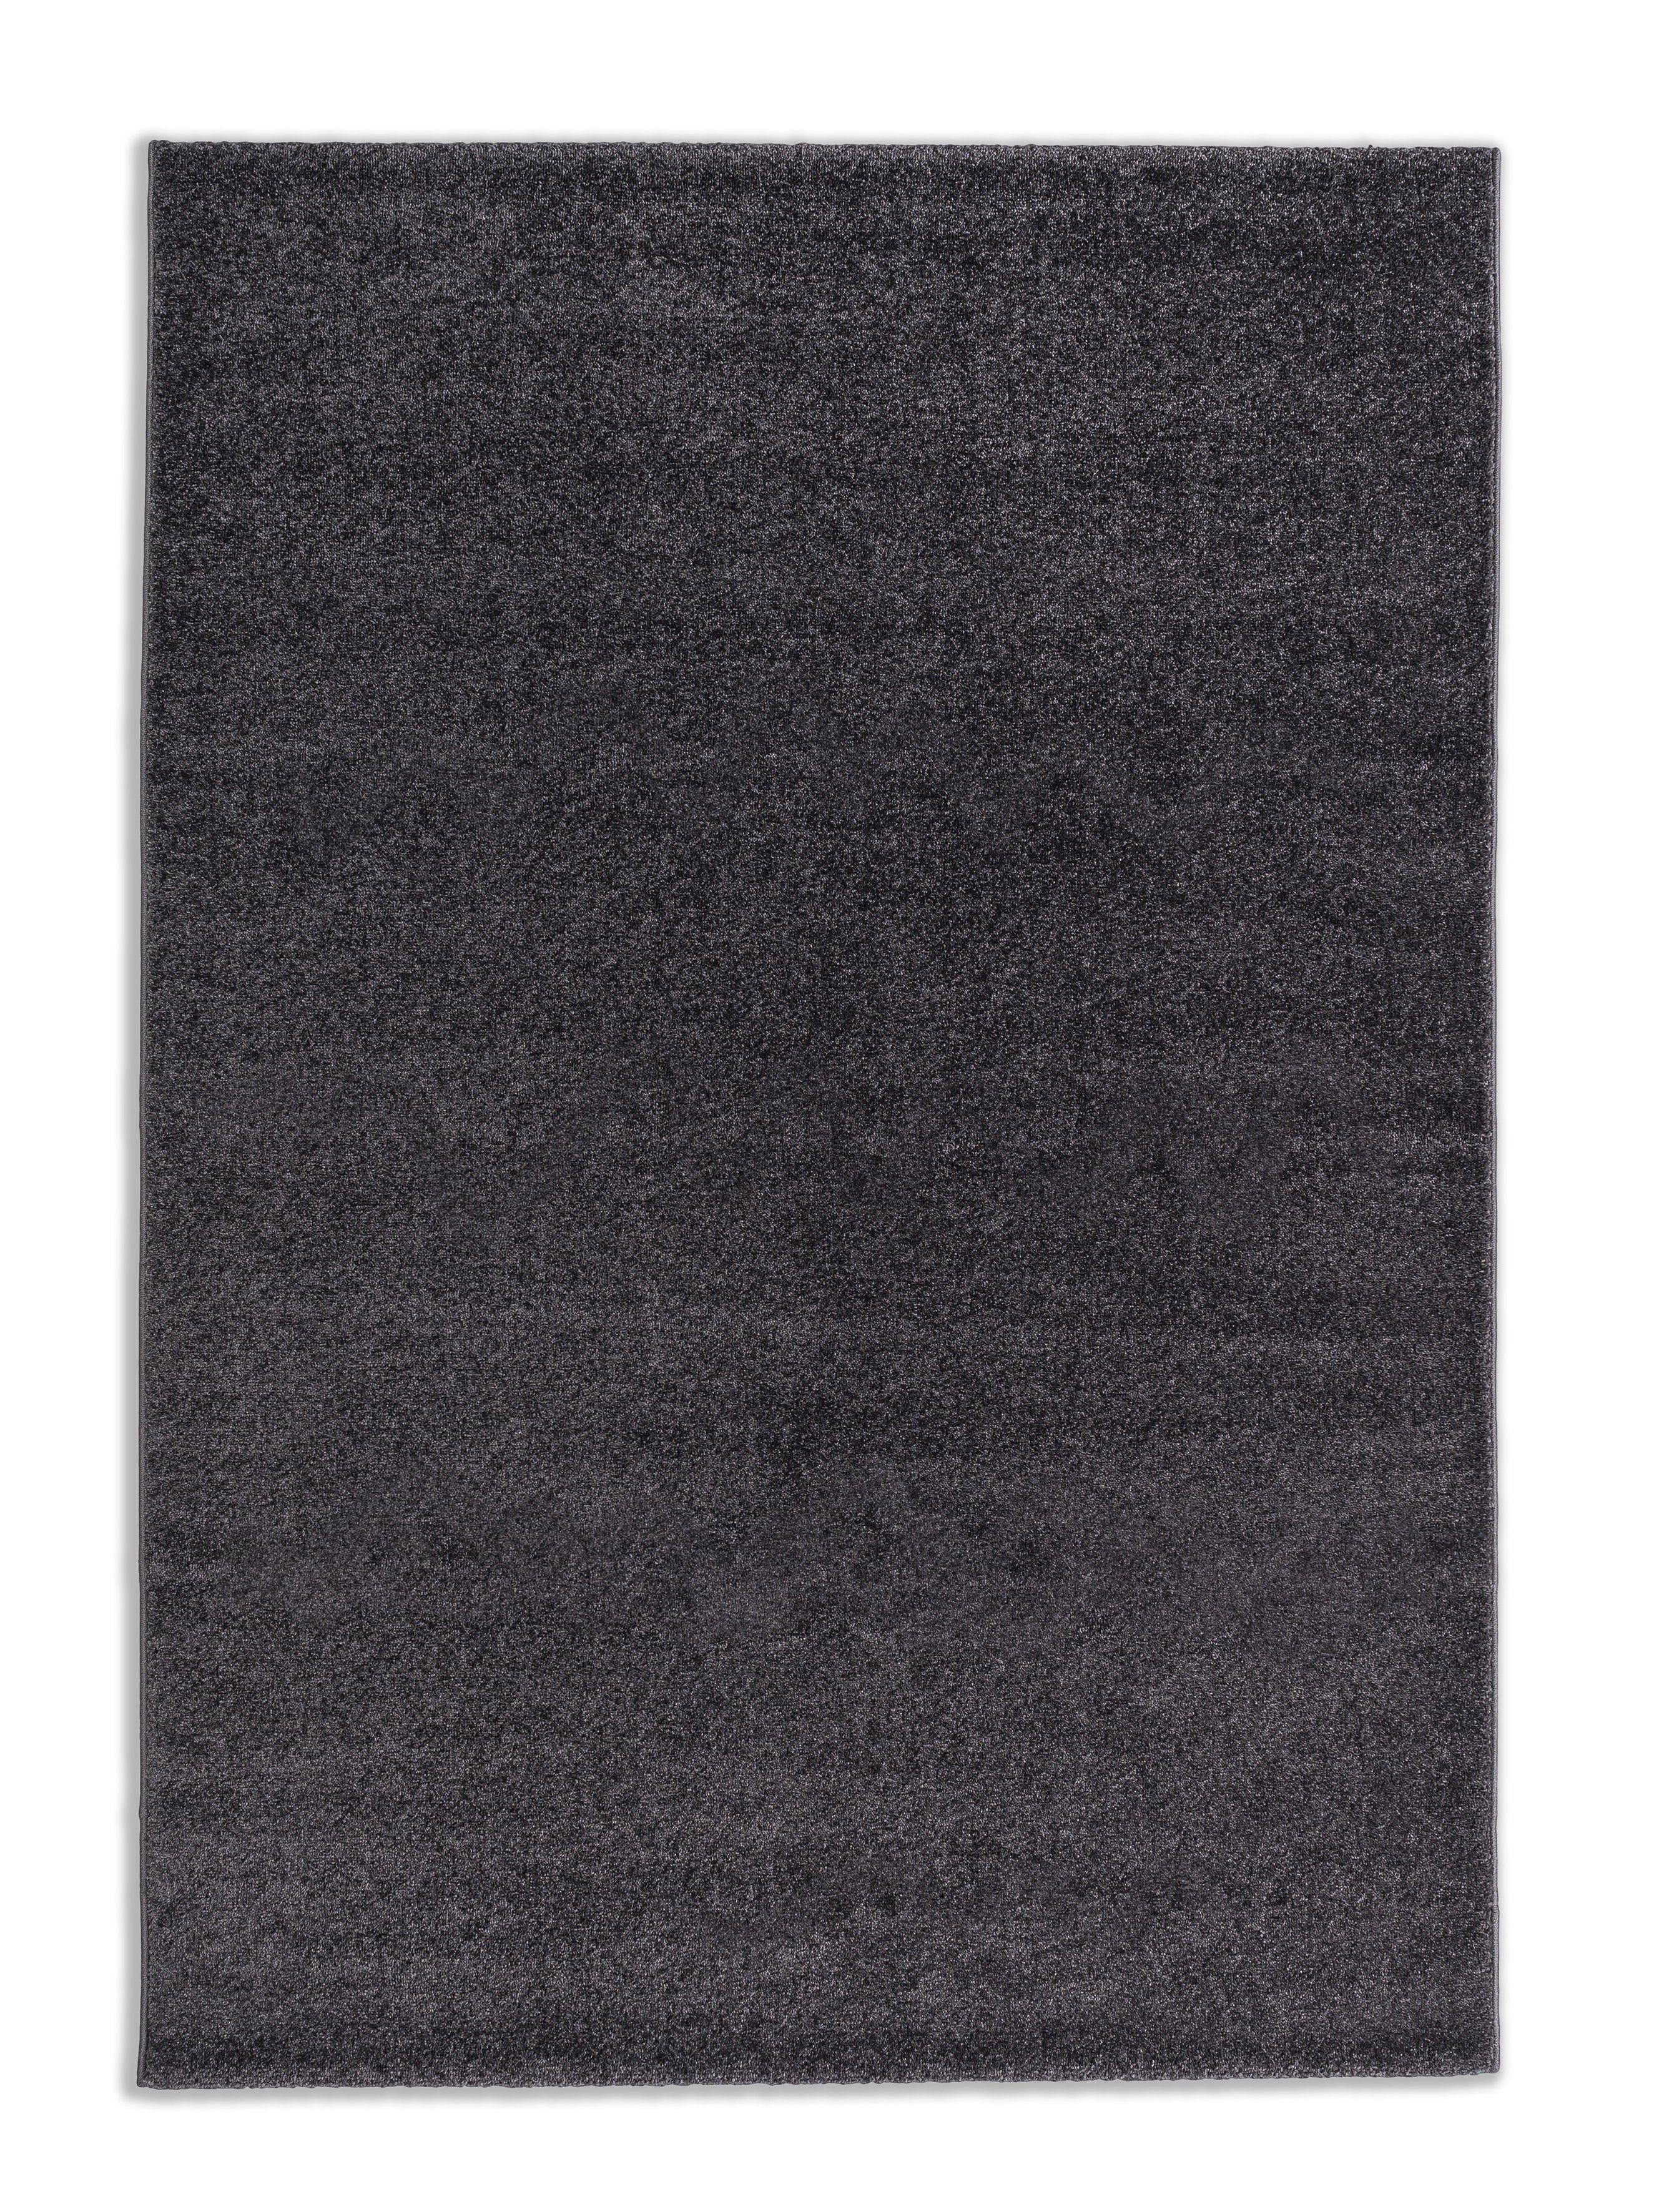 Astra - Golze koberce Kusový koberec Anzio 190040 Anthracite - 160x230 cm